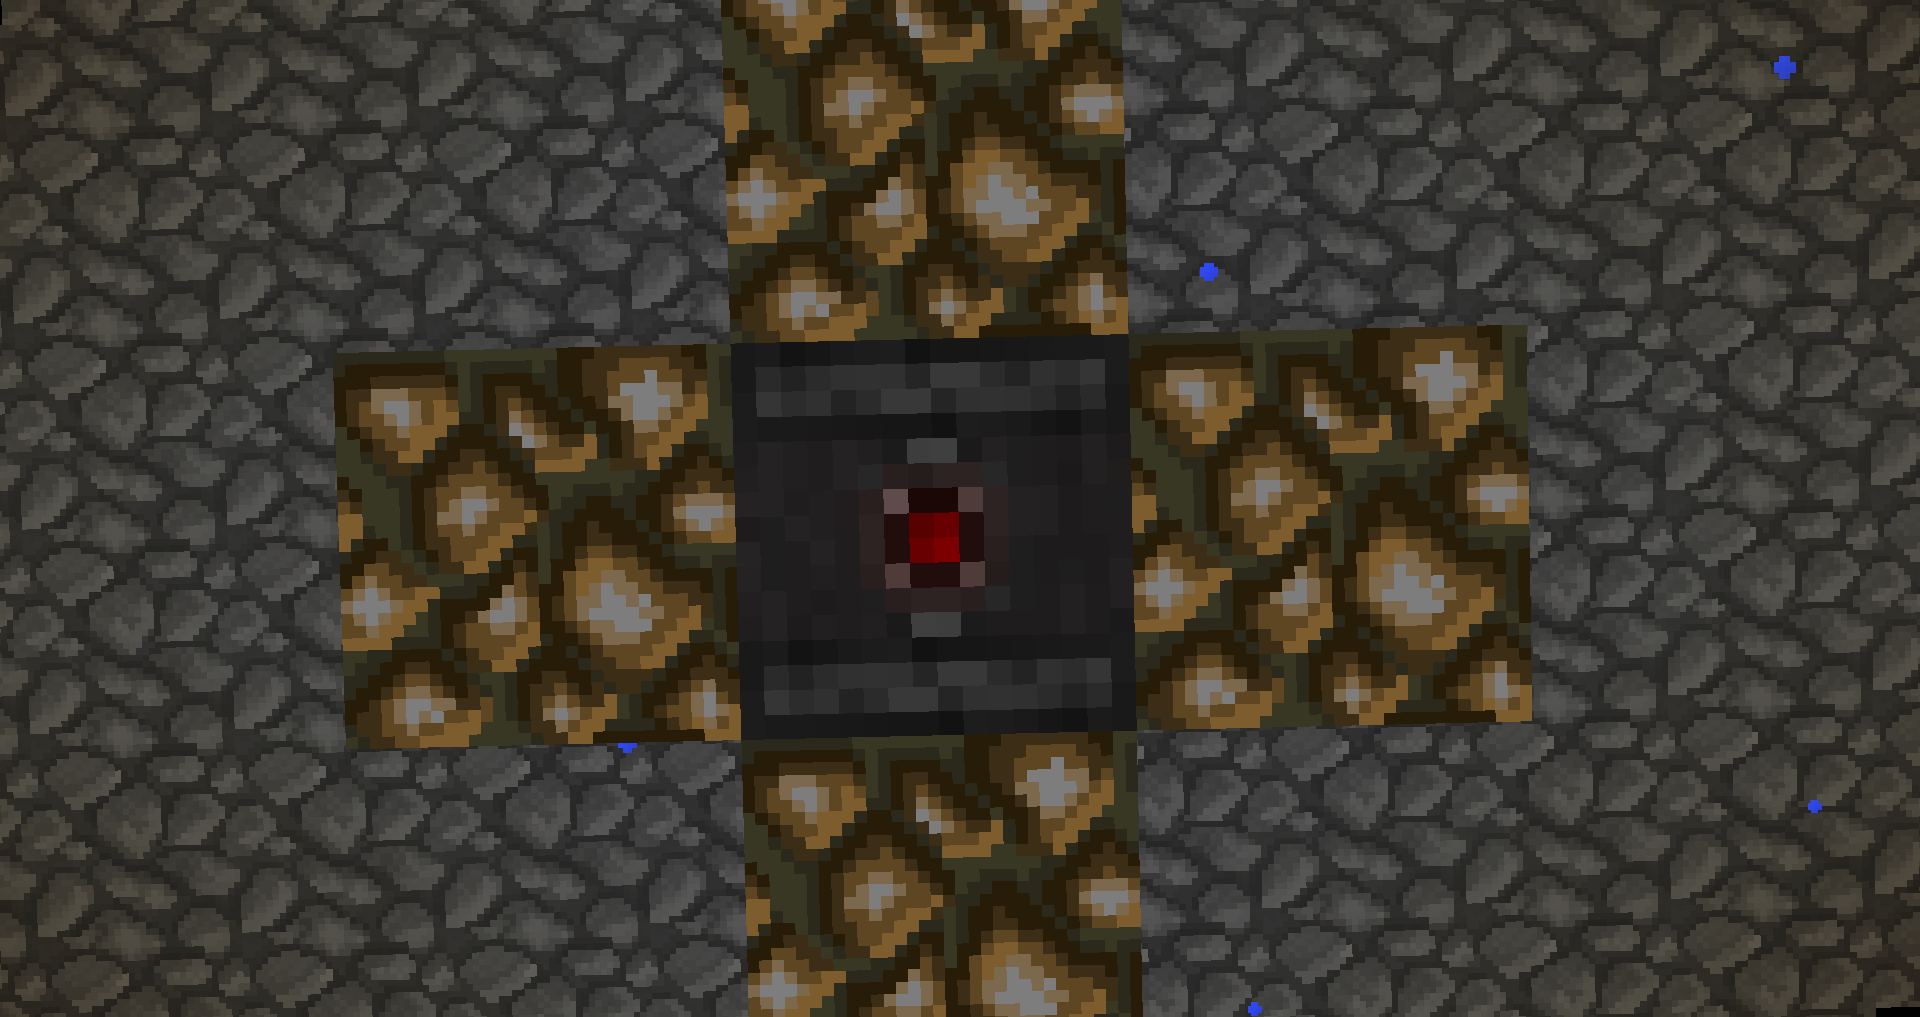 MC-110552] Observer block stays powered indefinitely - Jira